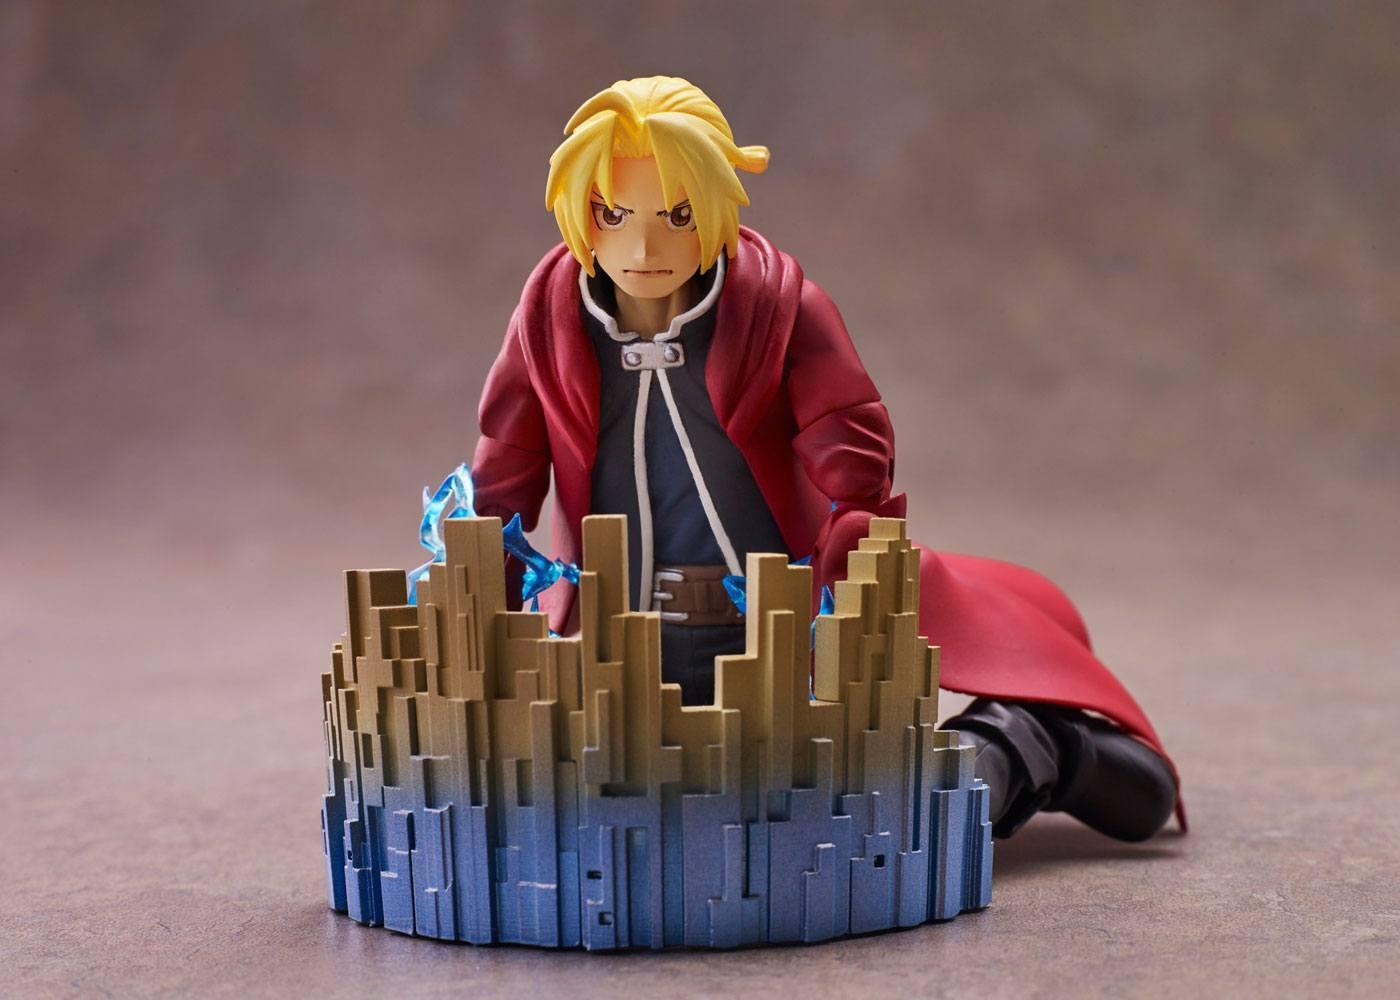 Fullmetal alchemist figurine edward elric 7